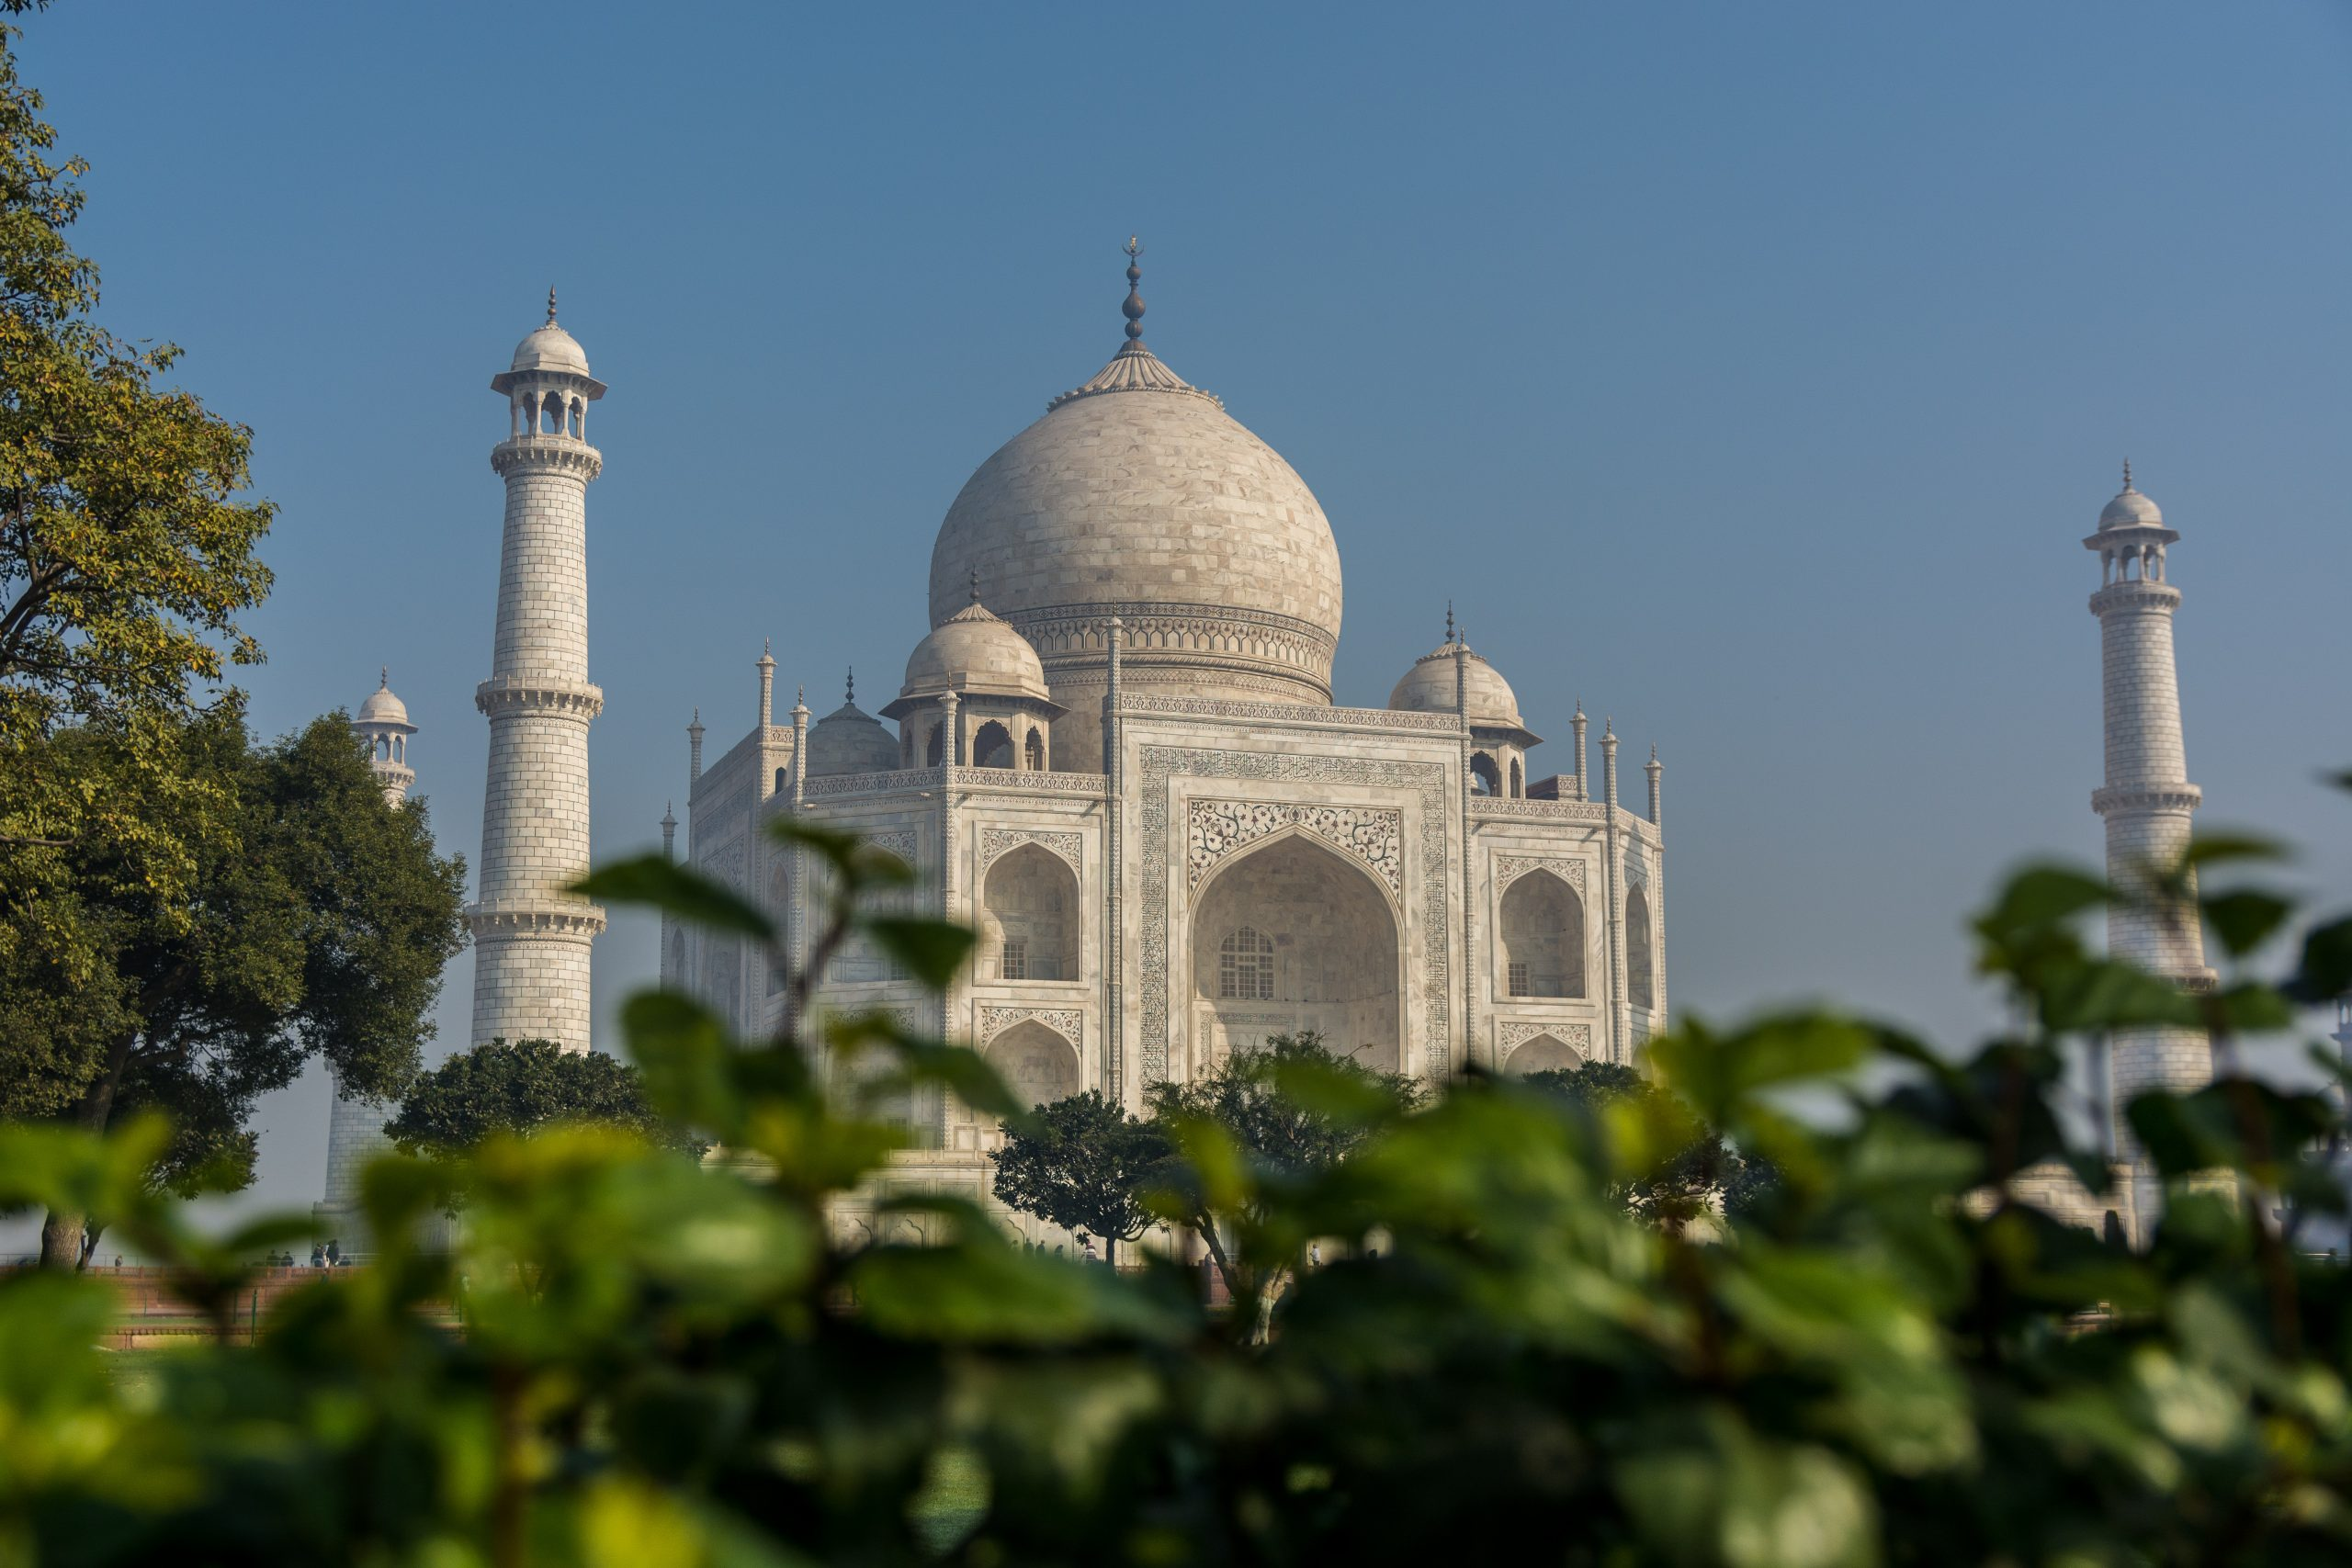 Glimpse of Taj Mahal